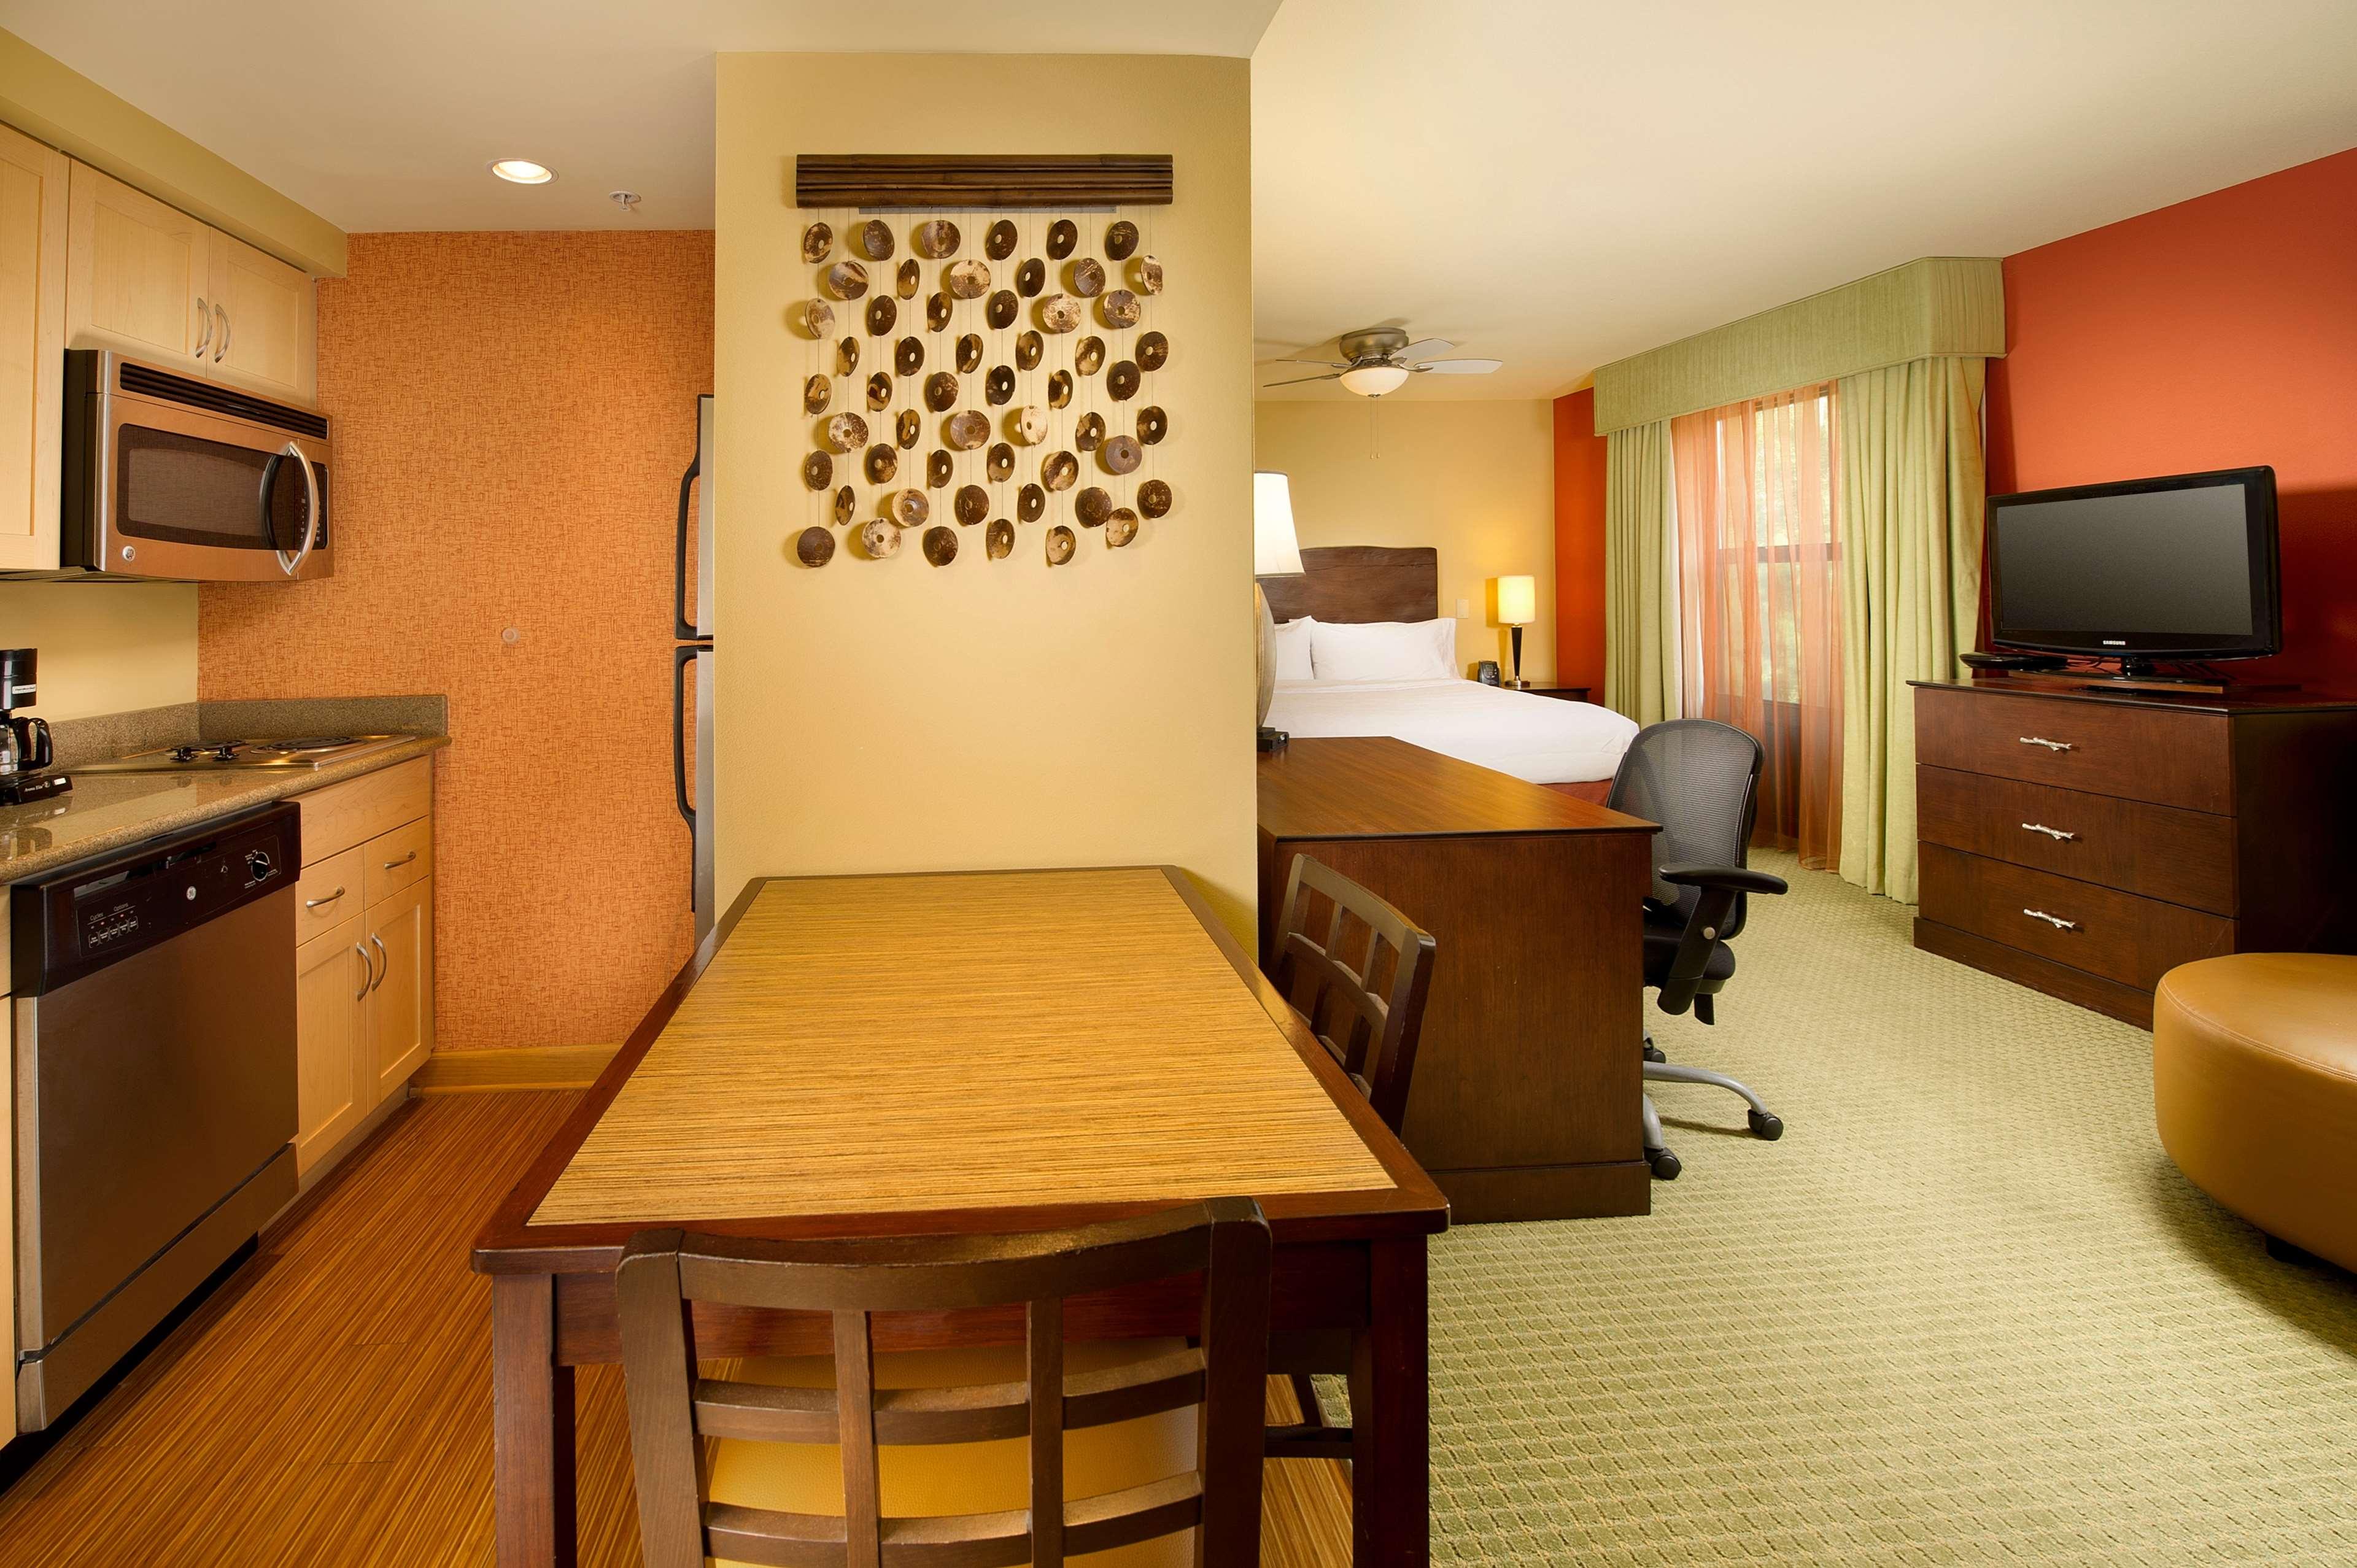 Homewood Suites by Hilton Columbus image 19